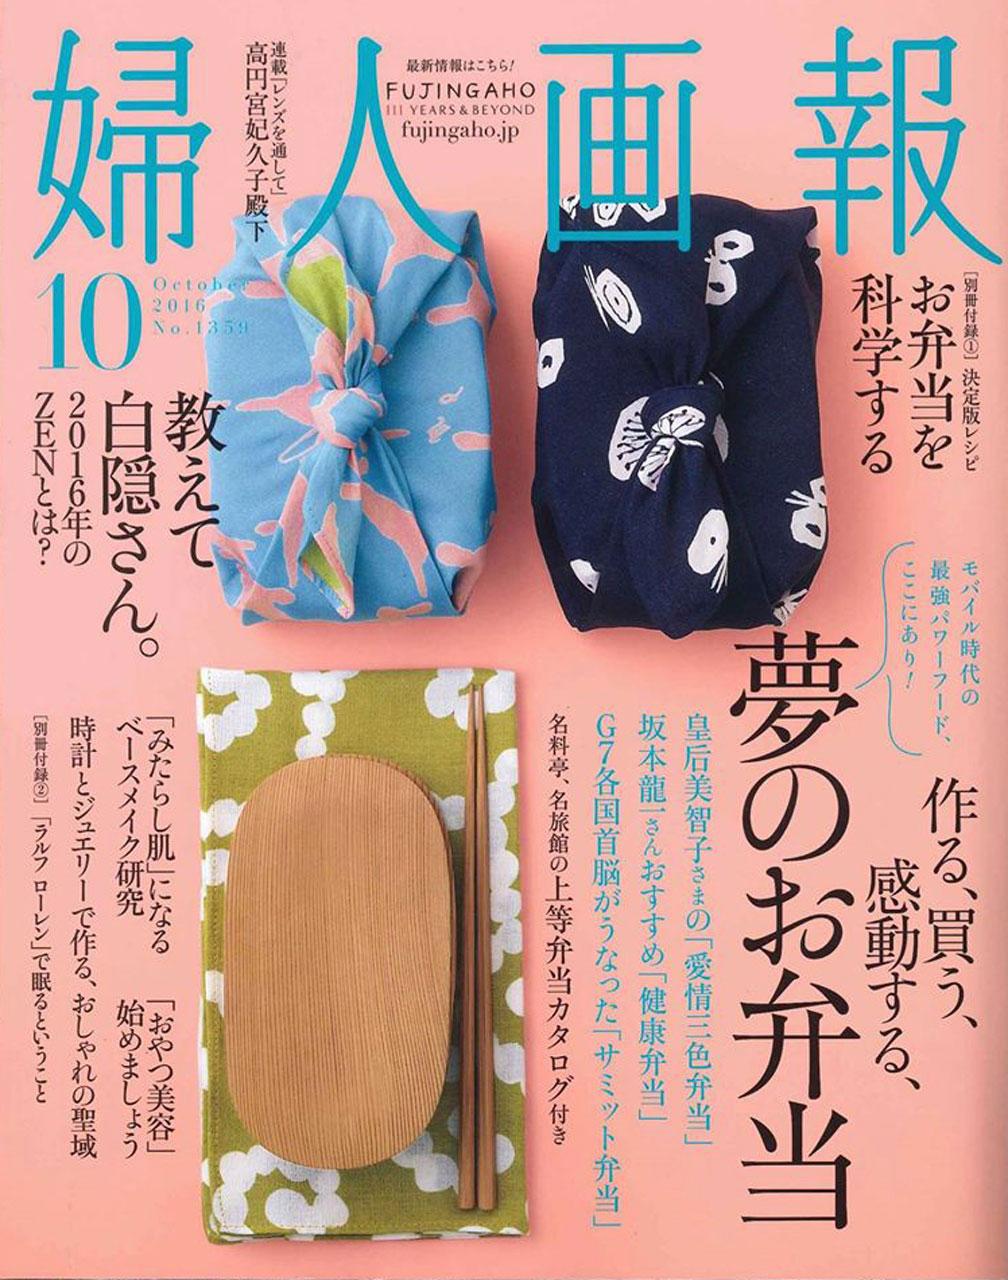 fujin-gaho_1610